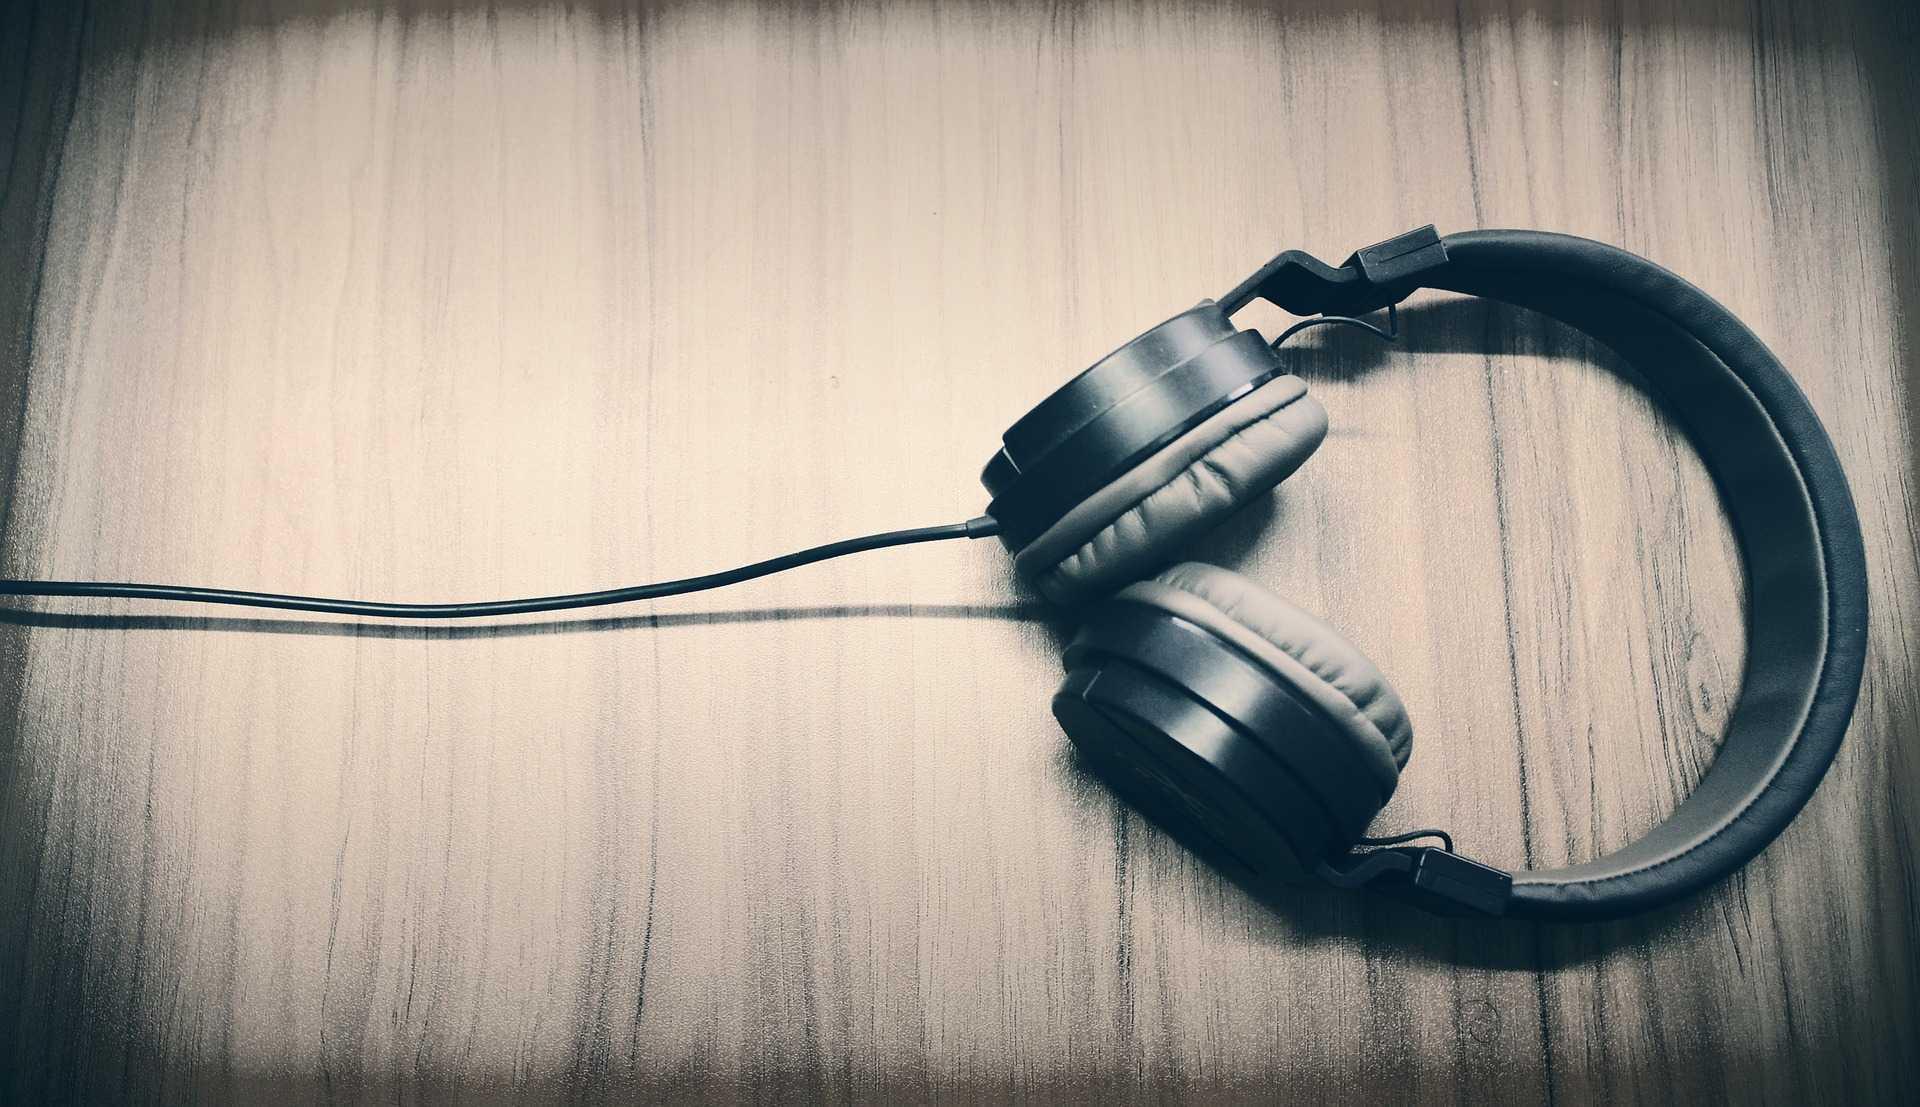 noise cancelling headphones future